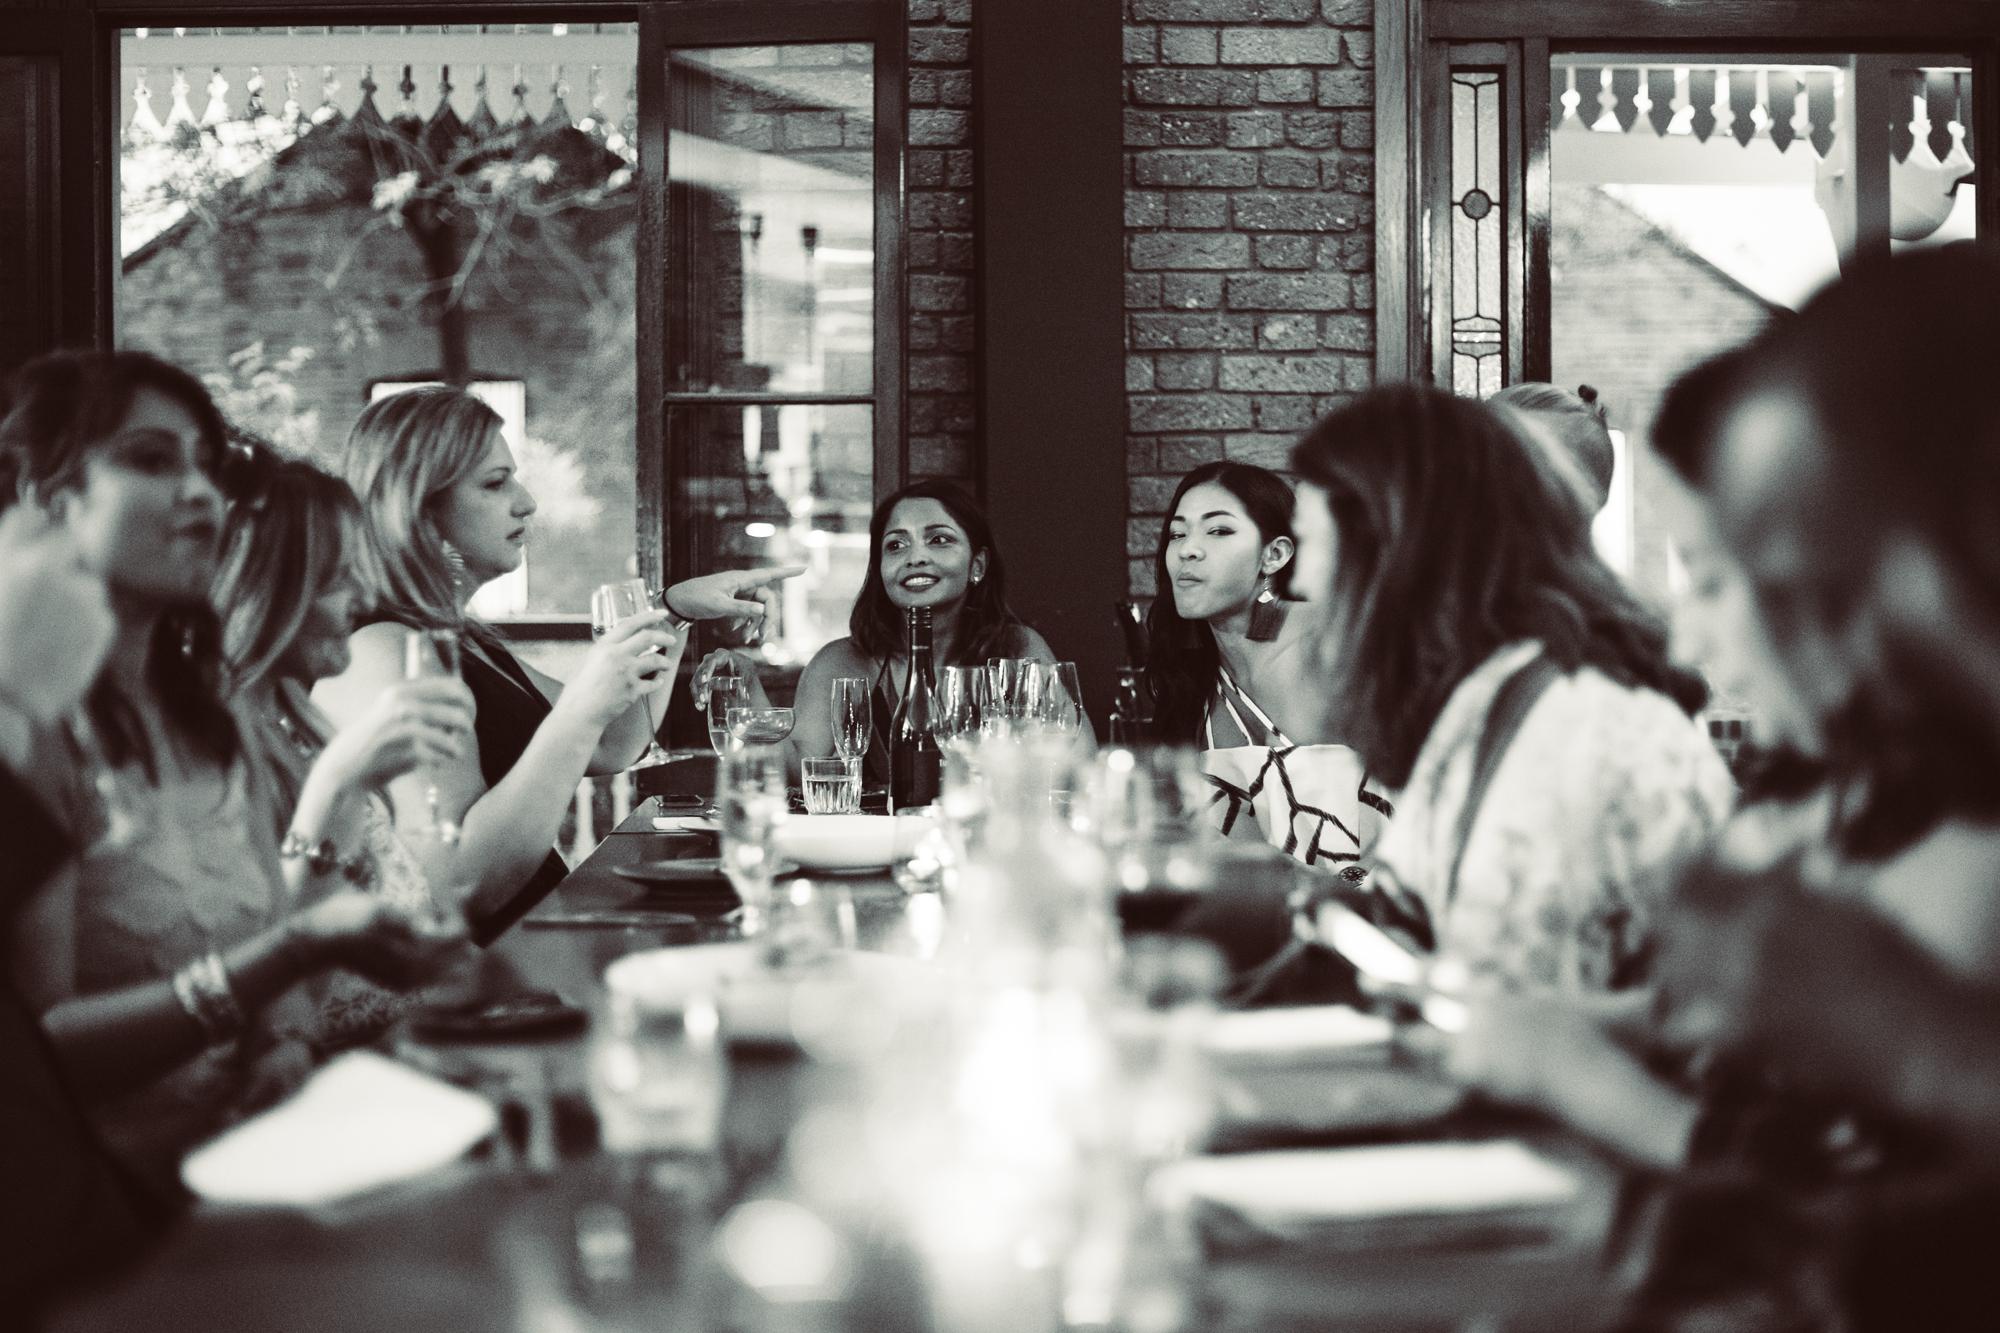 Aditi & Rafaels Wedding_Dinner & Drinks_15.jpg